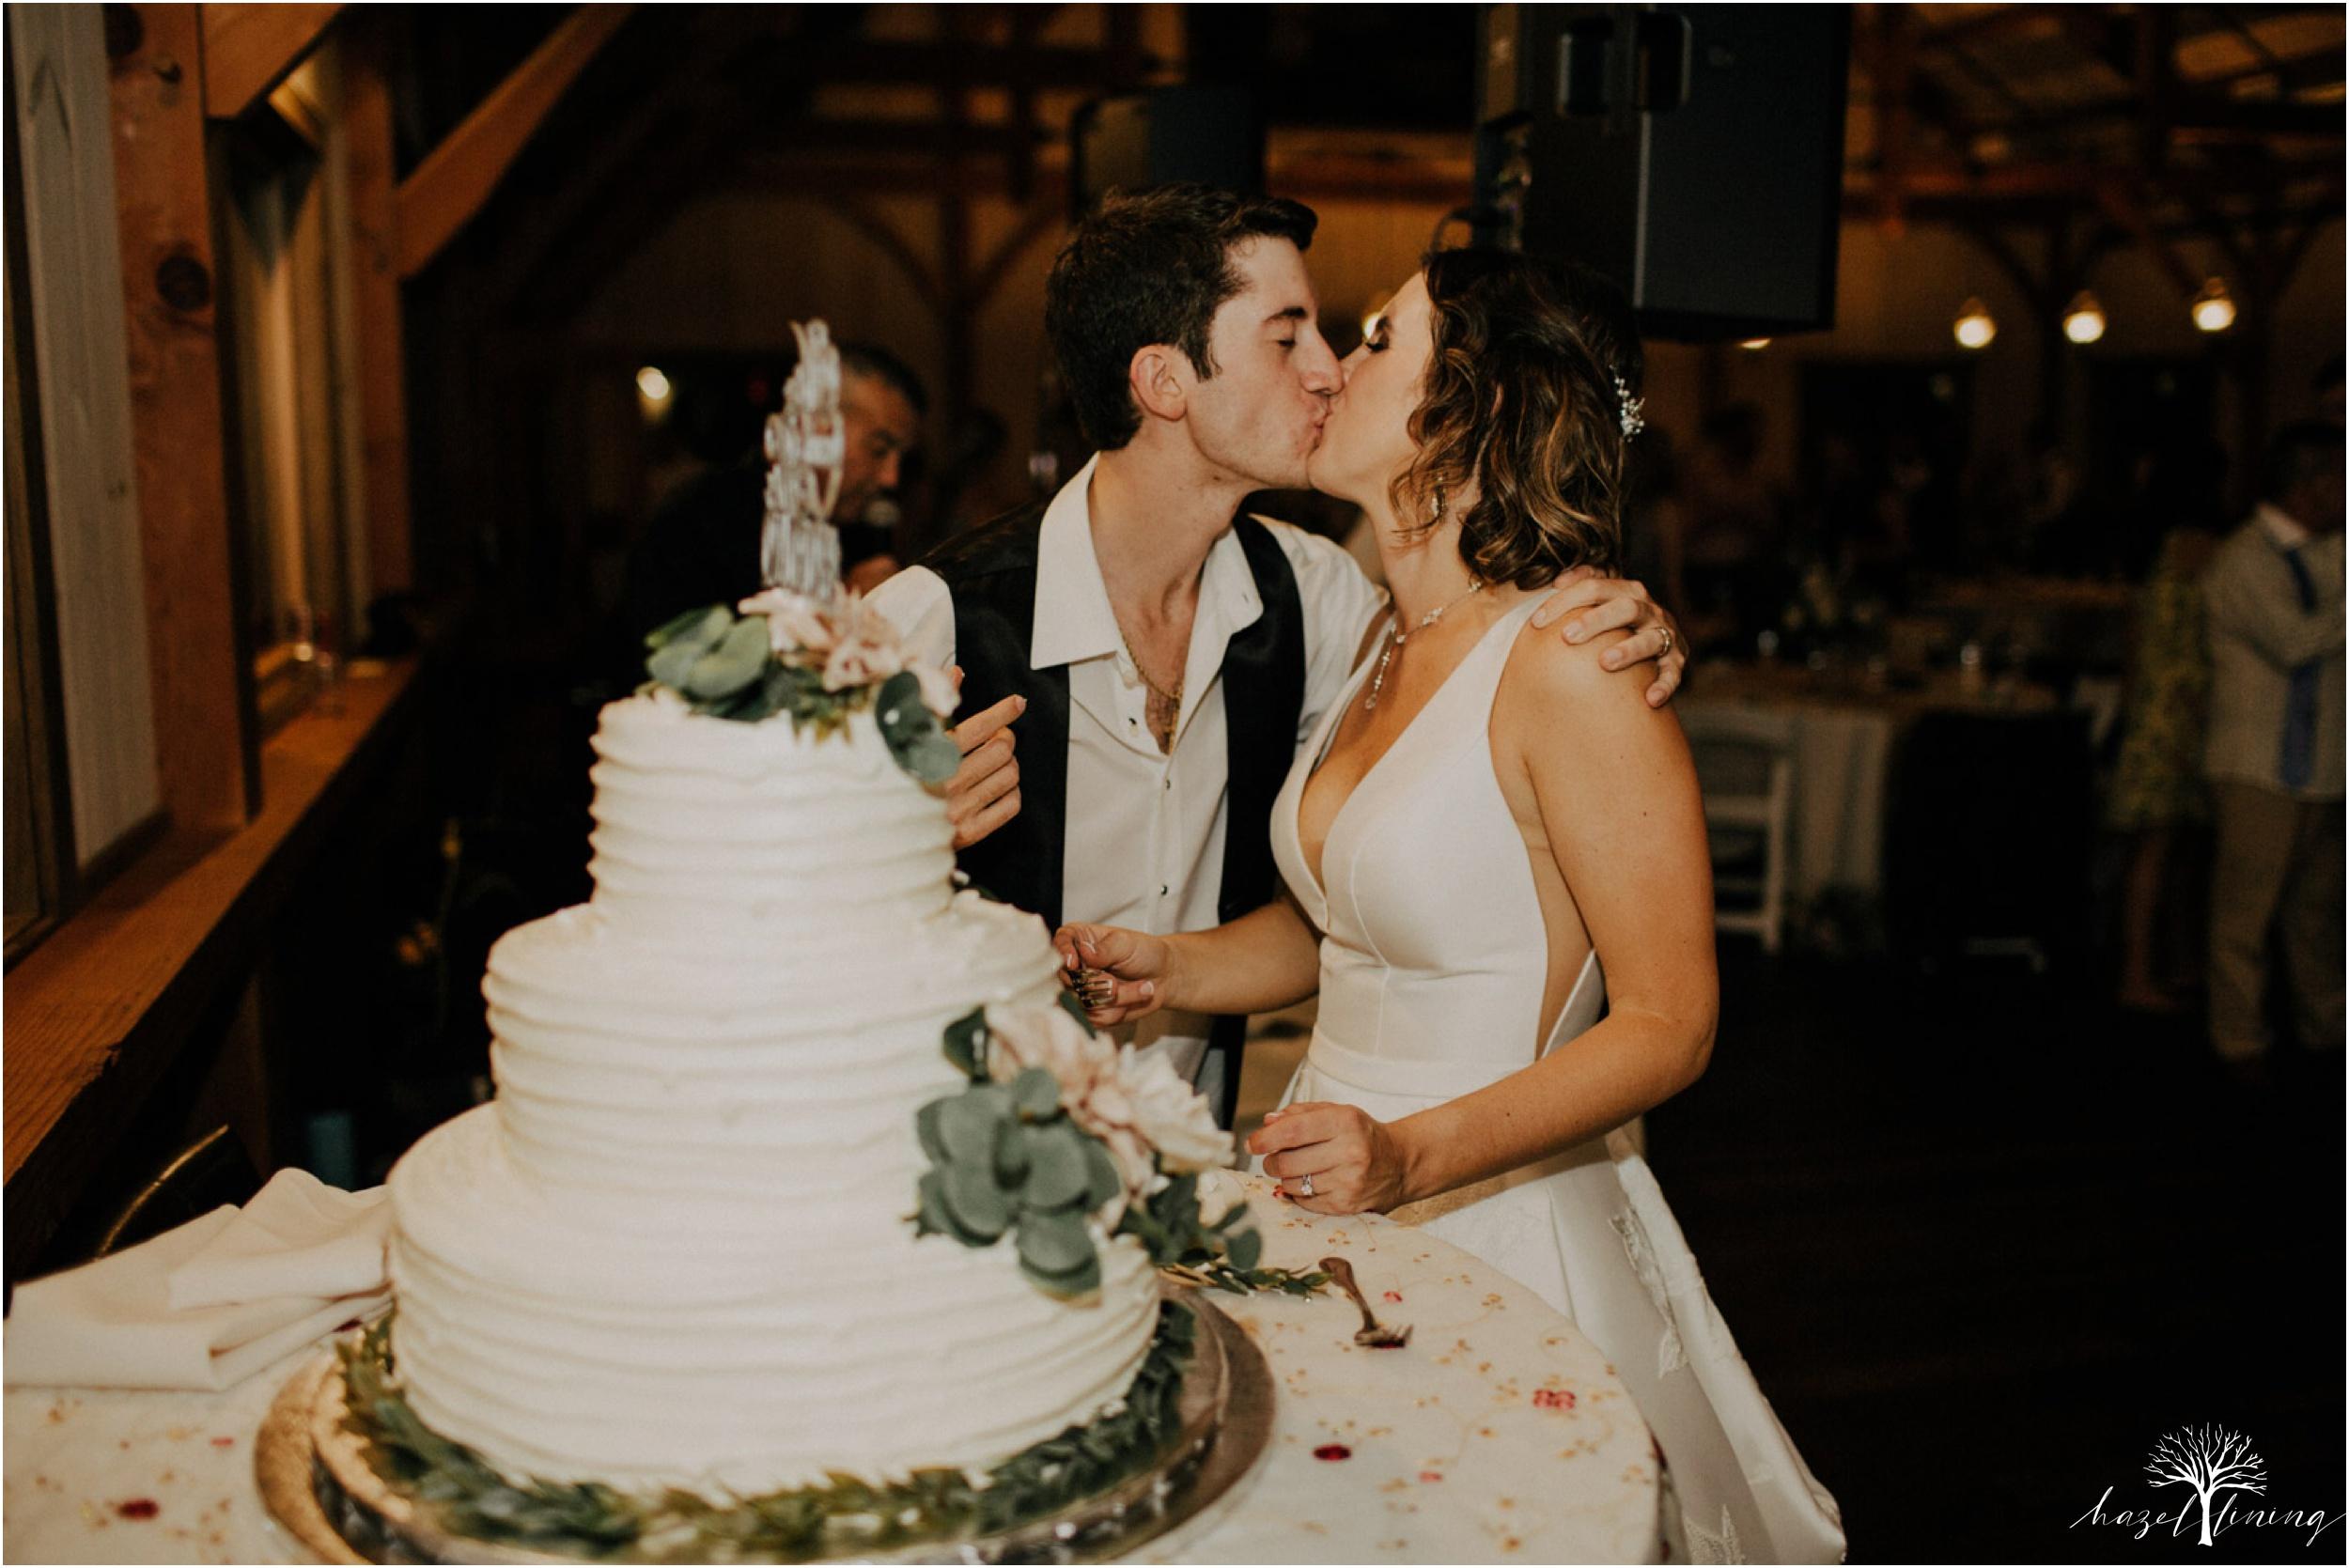 maureen-hepner-anthony-giordano-rose-bank-winery-newtow-pennsylvania-luxury-summer-wedding-hazel-lining-photography-destination-elopement-wedding-engagement-photography_0163.jpg